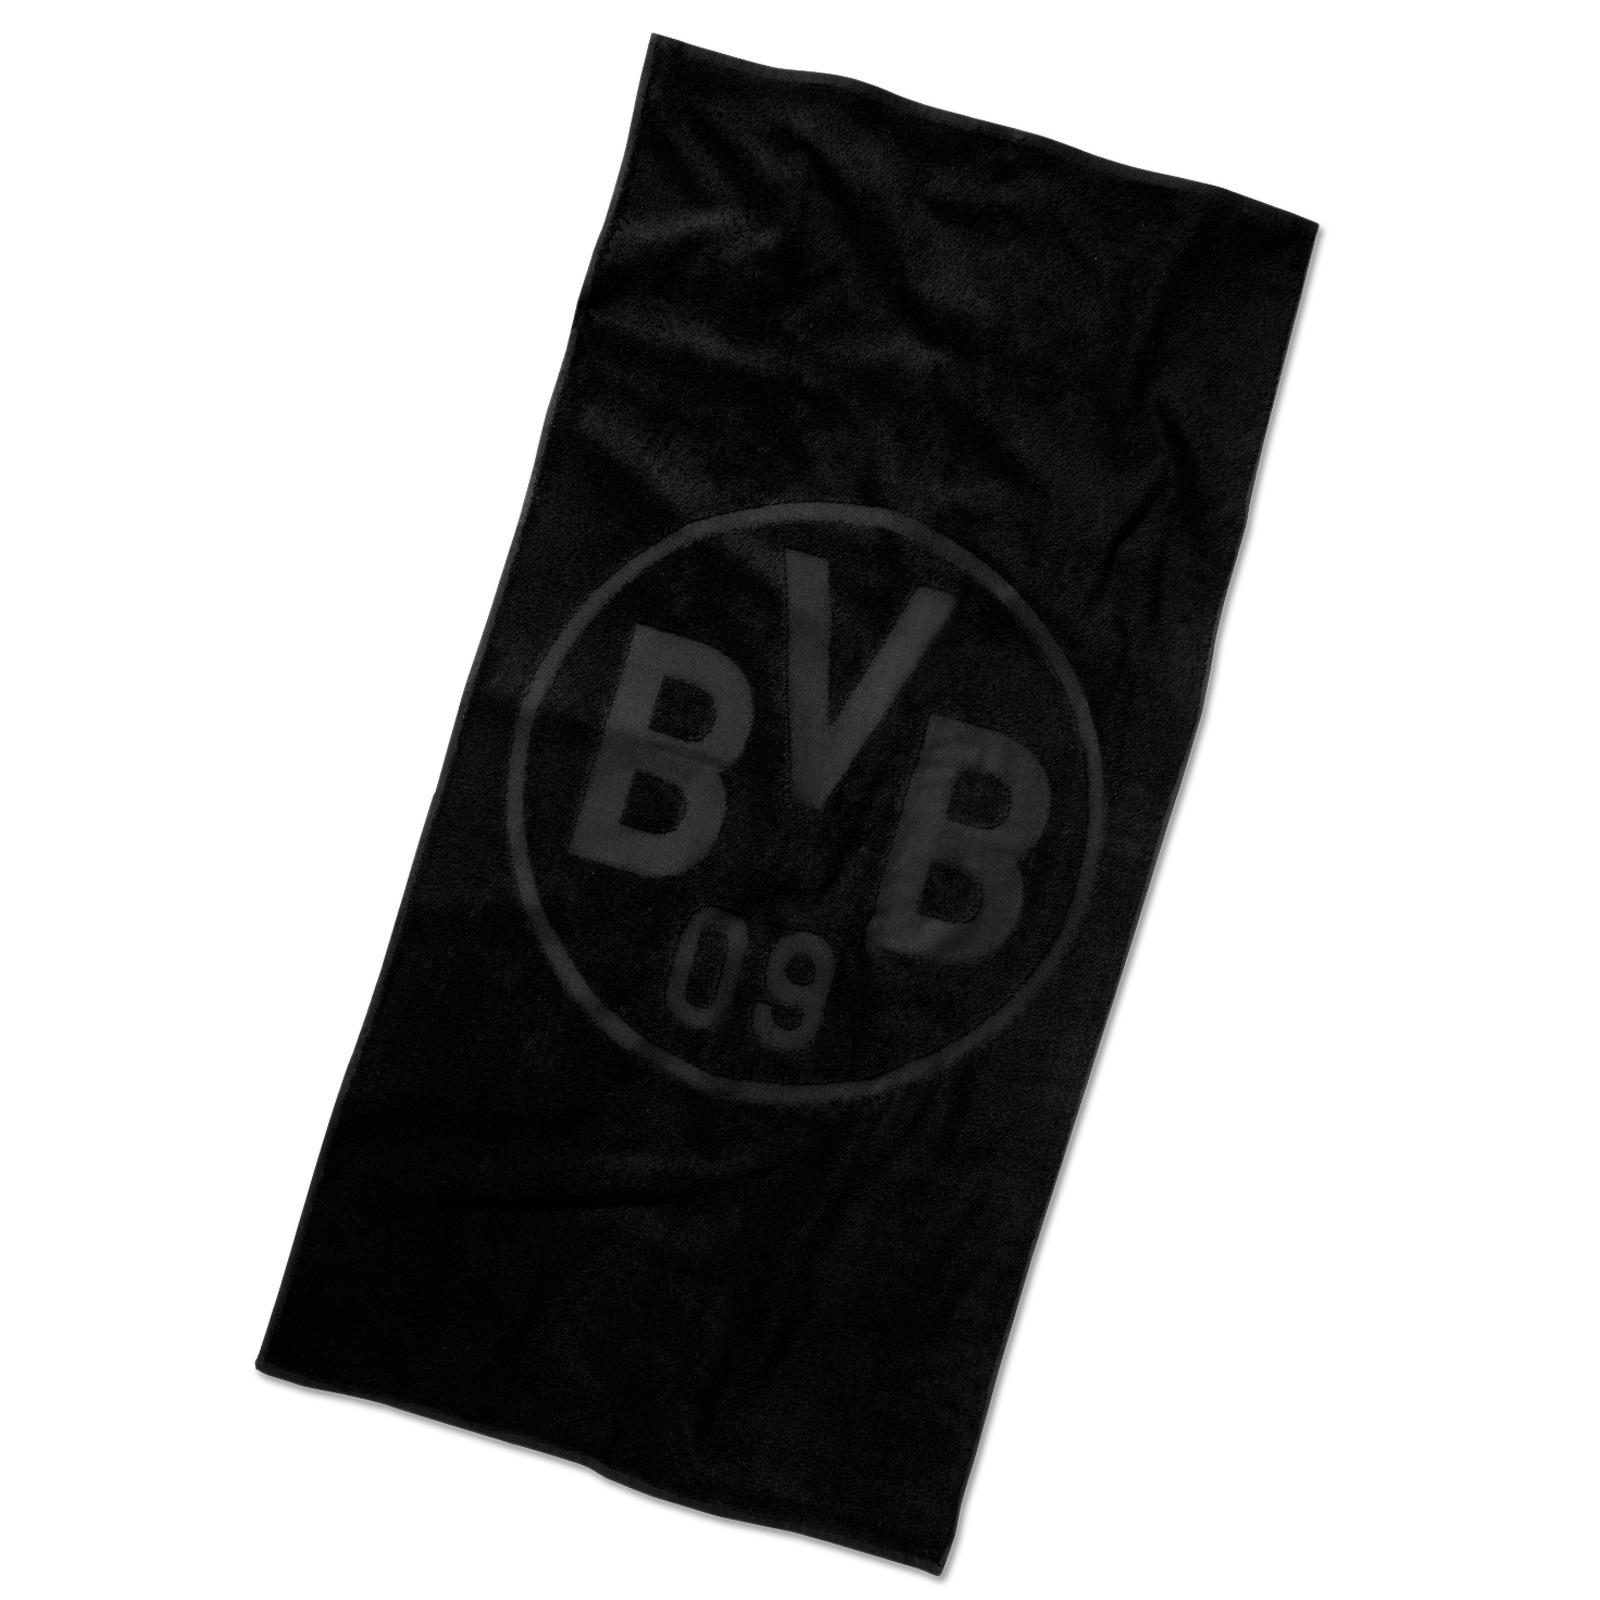 bvb badetuch emblem schwarz bad zu hause offizieller bvb online fanshop. Black Bedroom Furniture Sets. Home Design Ideas